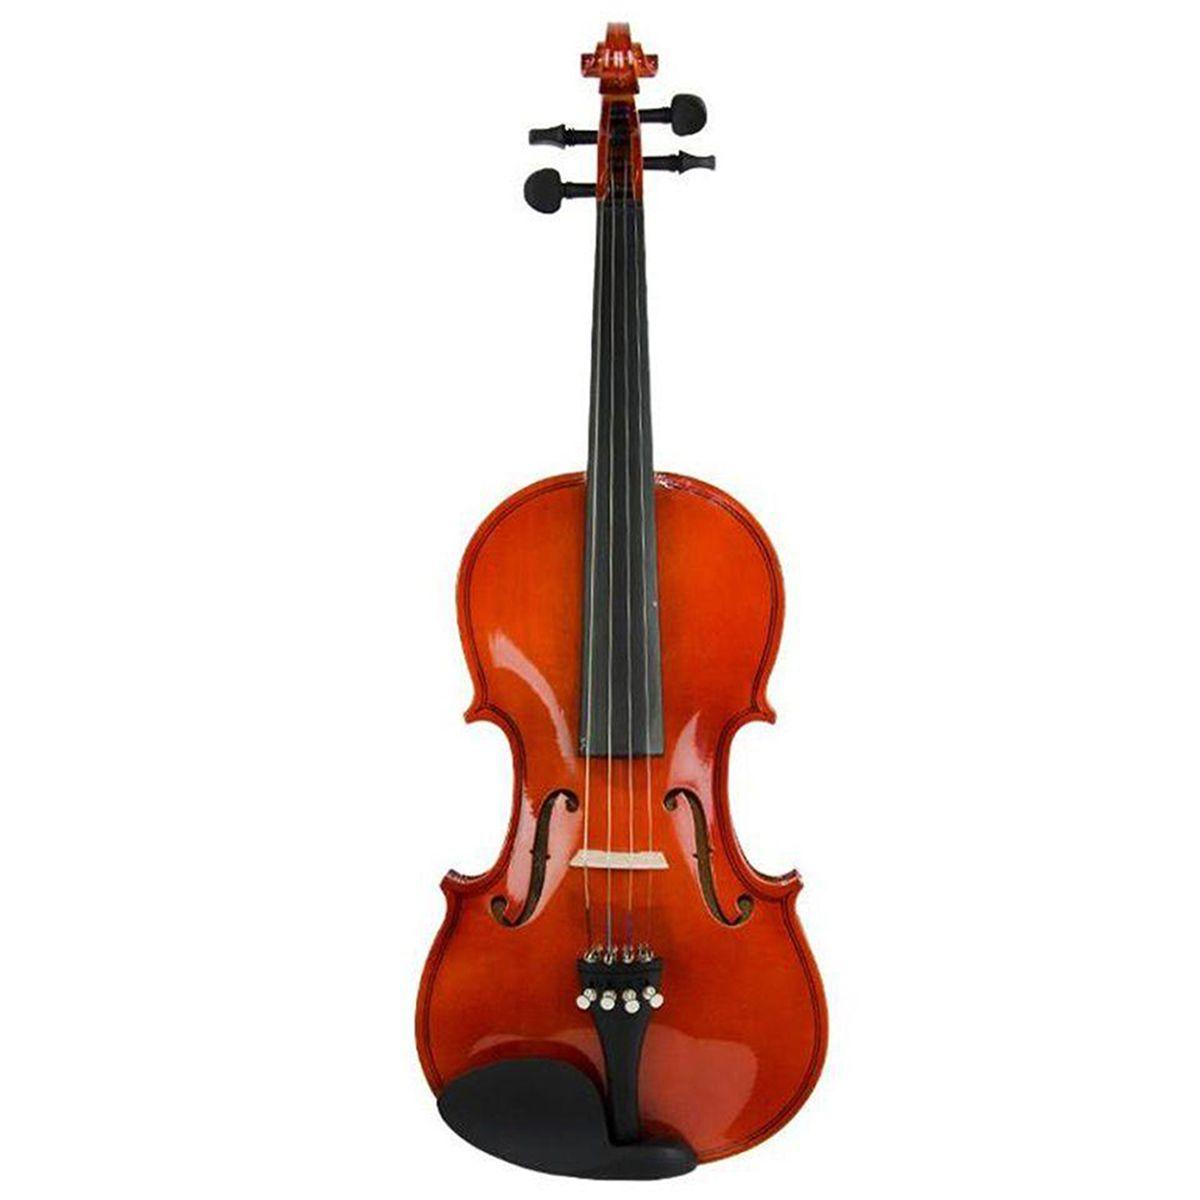 Violino Profissional Vignoli Vig 344 4/4 Natural com Case